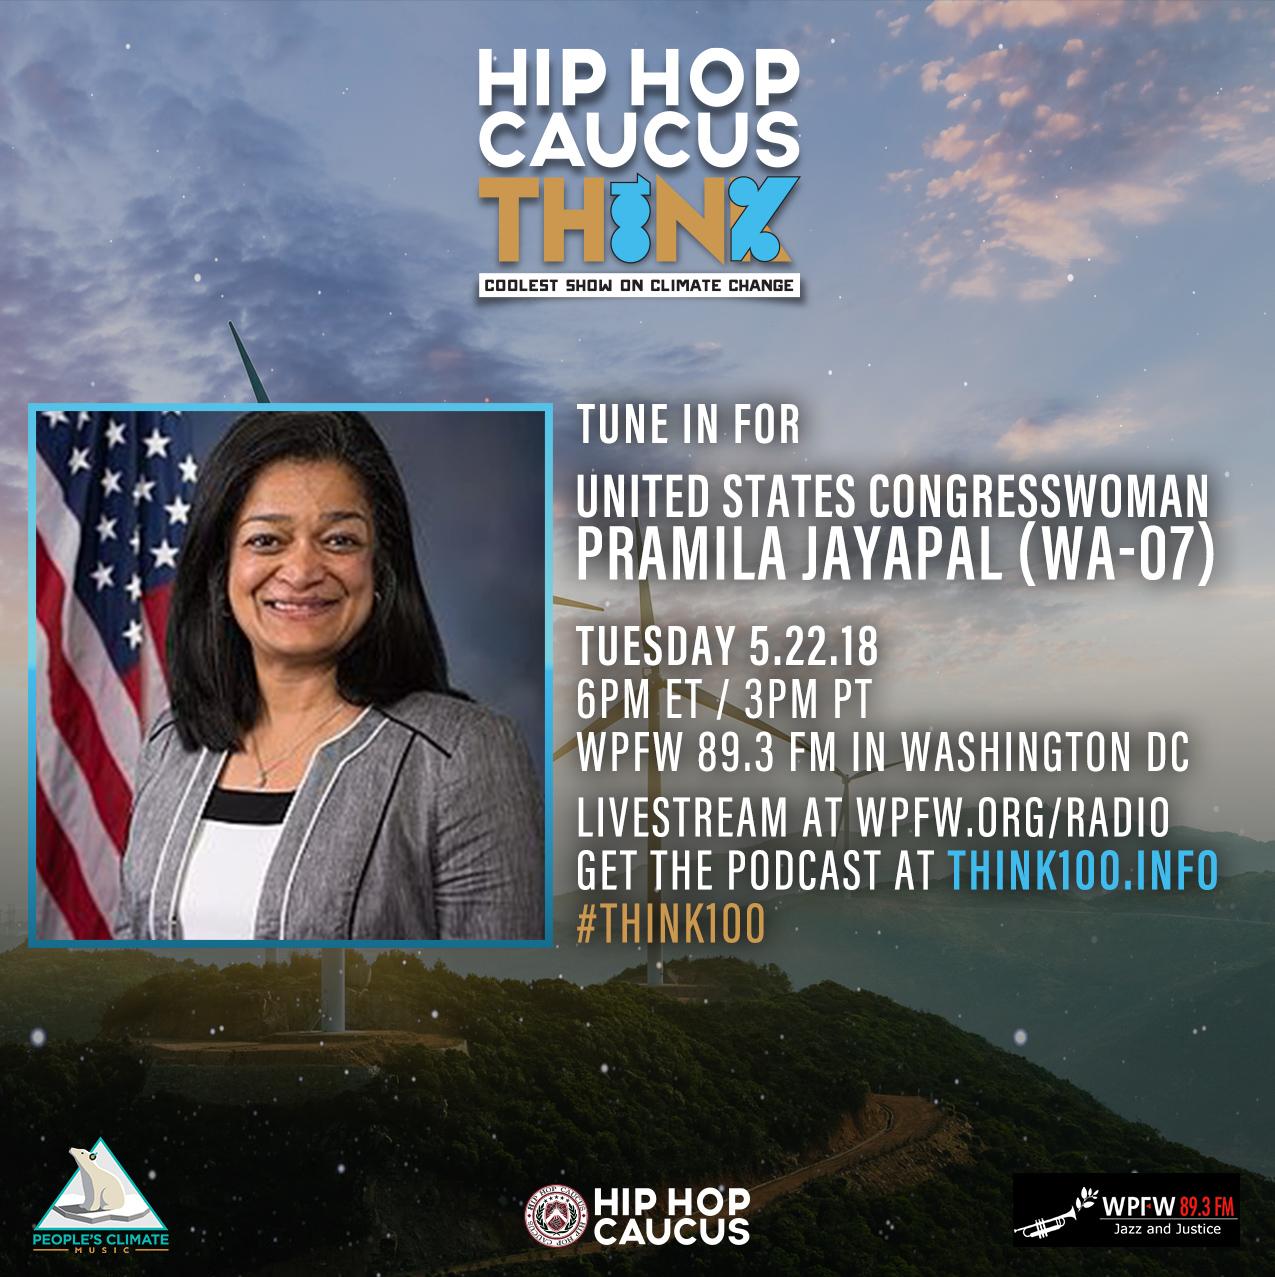 United States Congresswoman Pramila Jayapal (WA-07)